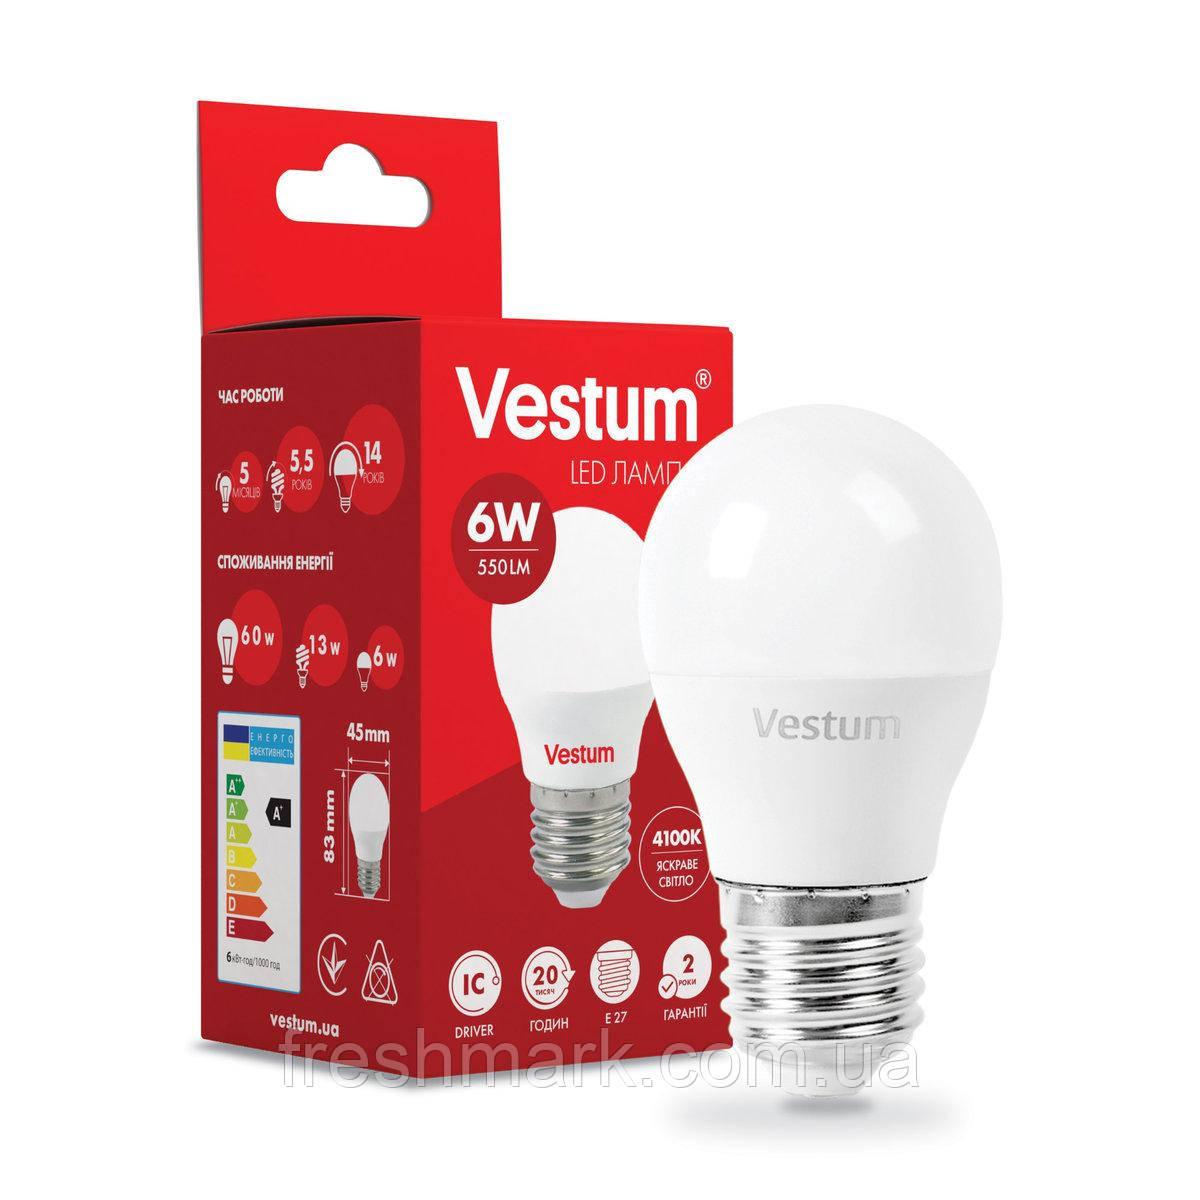 Світлодіодна лампа Vestum LED G45 6W 4100K 220V E27